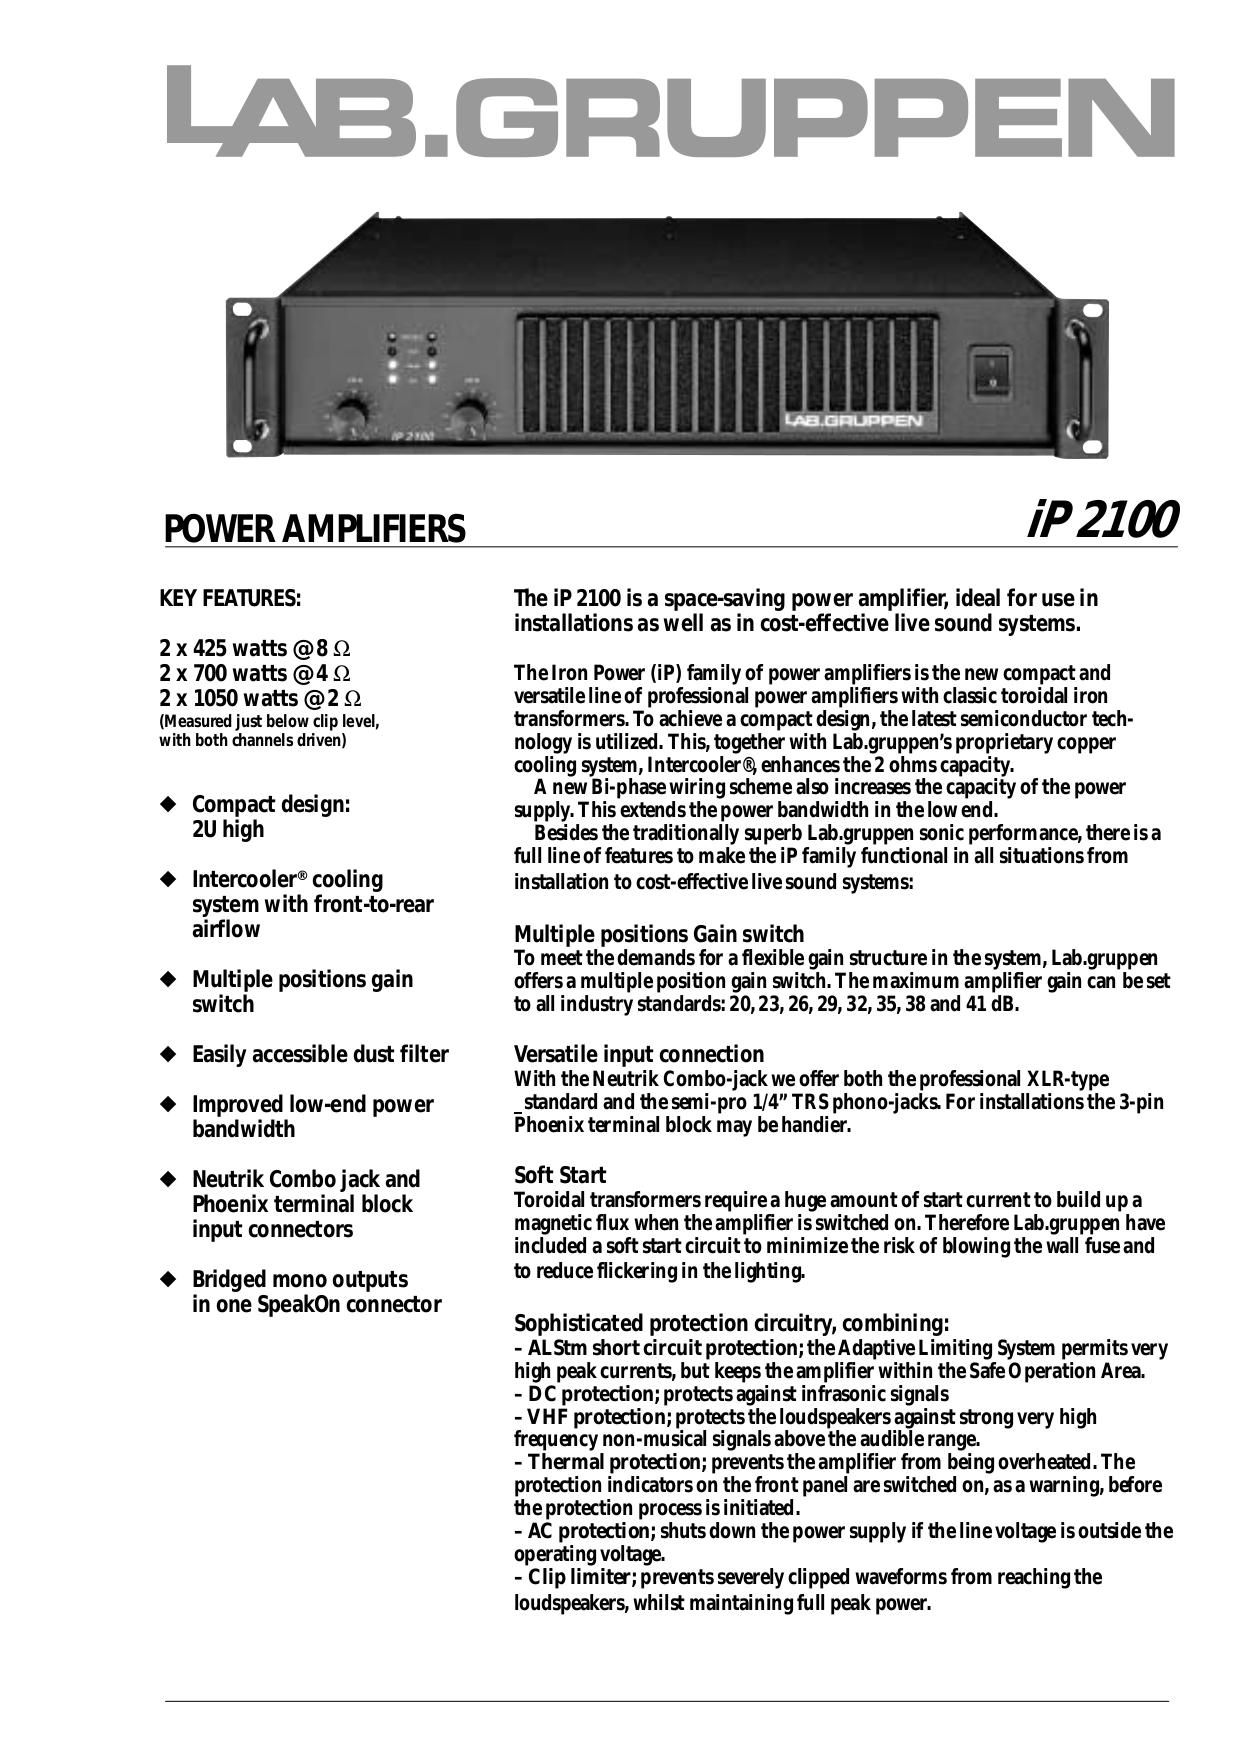 pdf for Lab.gruppen Amp LAB 2002 manual